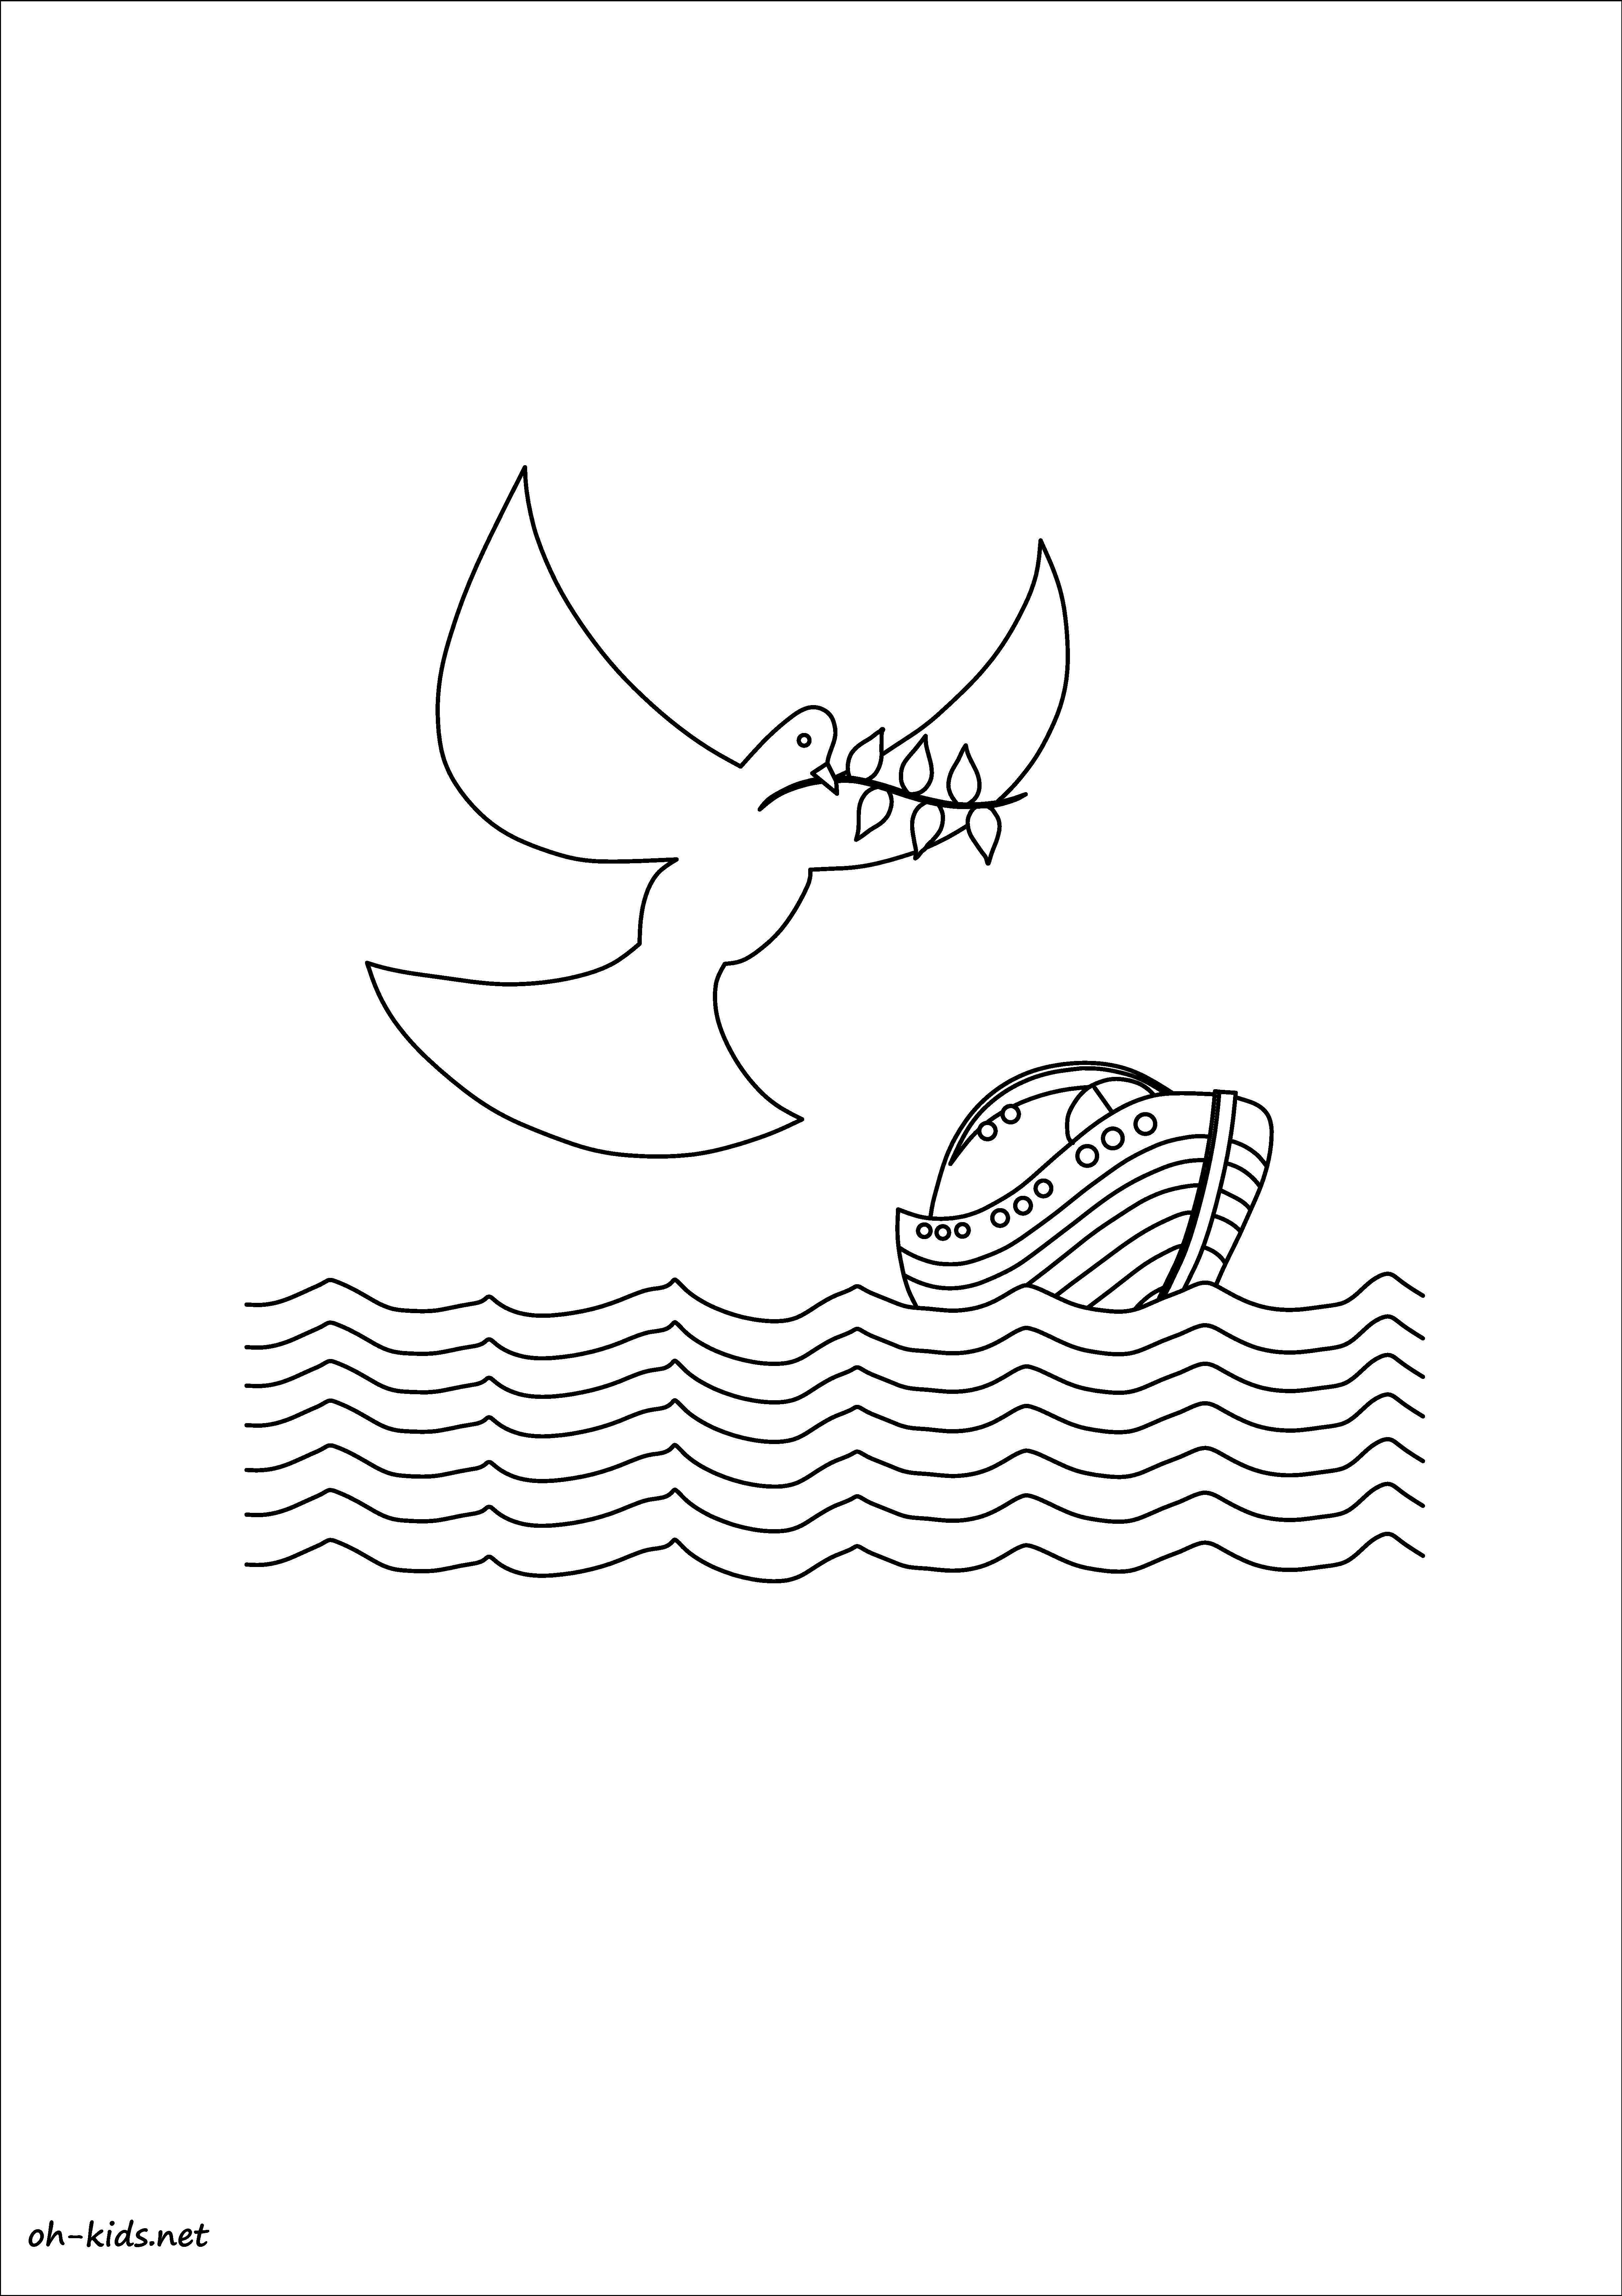 image de colombe a dessiner - Dessin #376